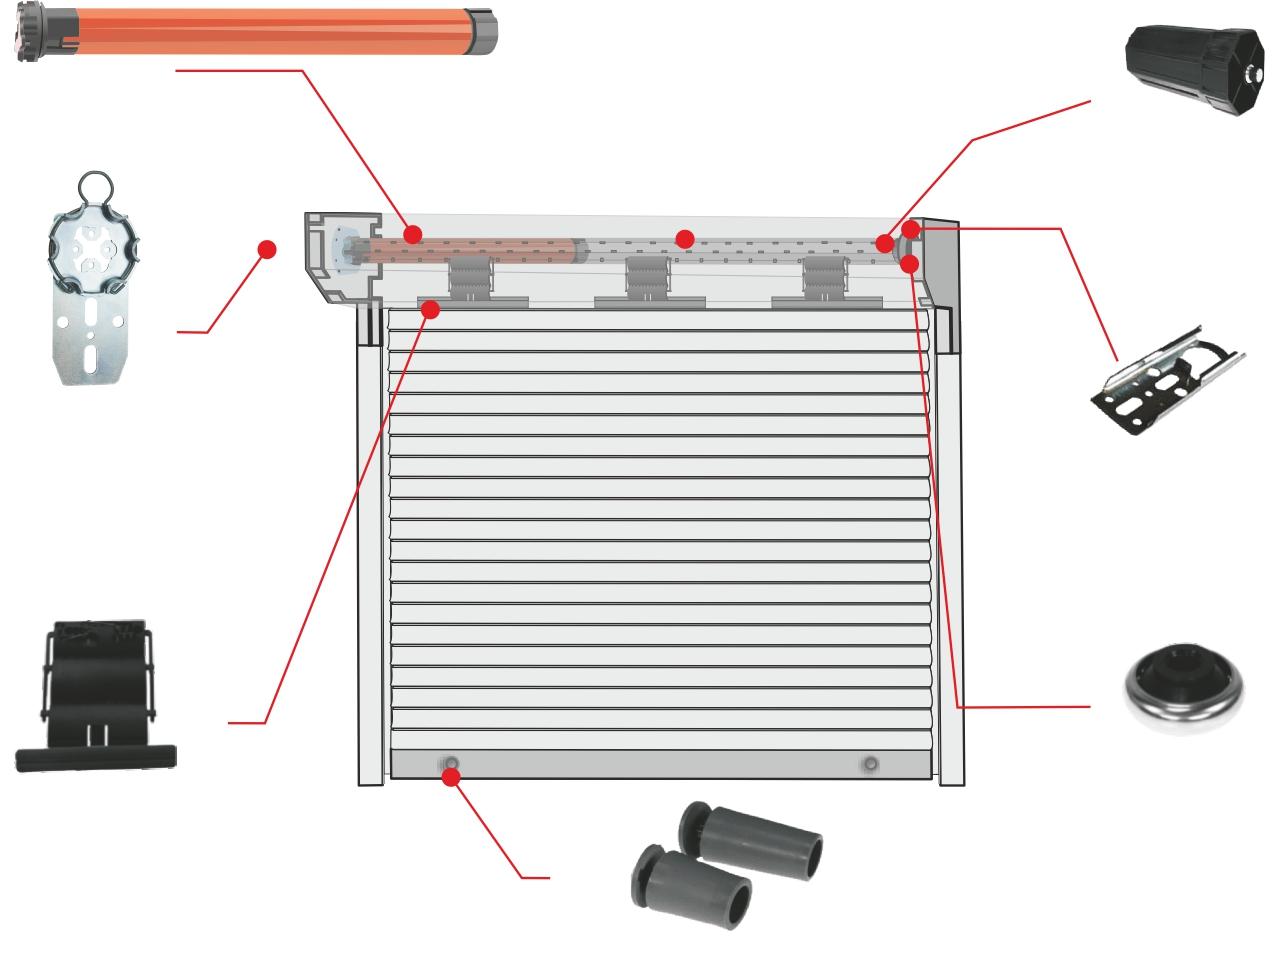 Relativ heicko e-ast GmbH | Rohrmotor, elektronisch einstellbare Endlagen KG57